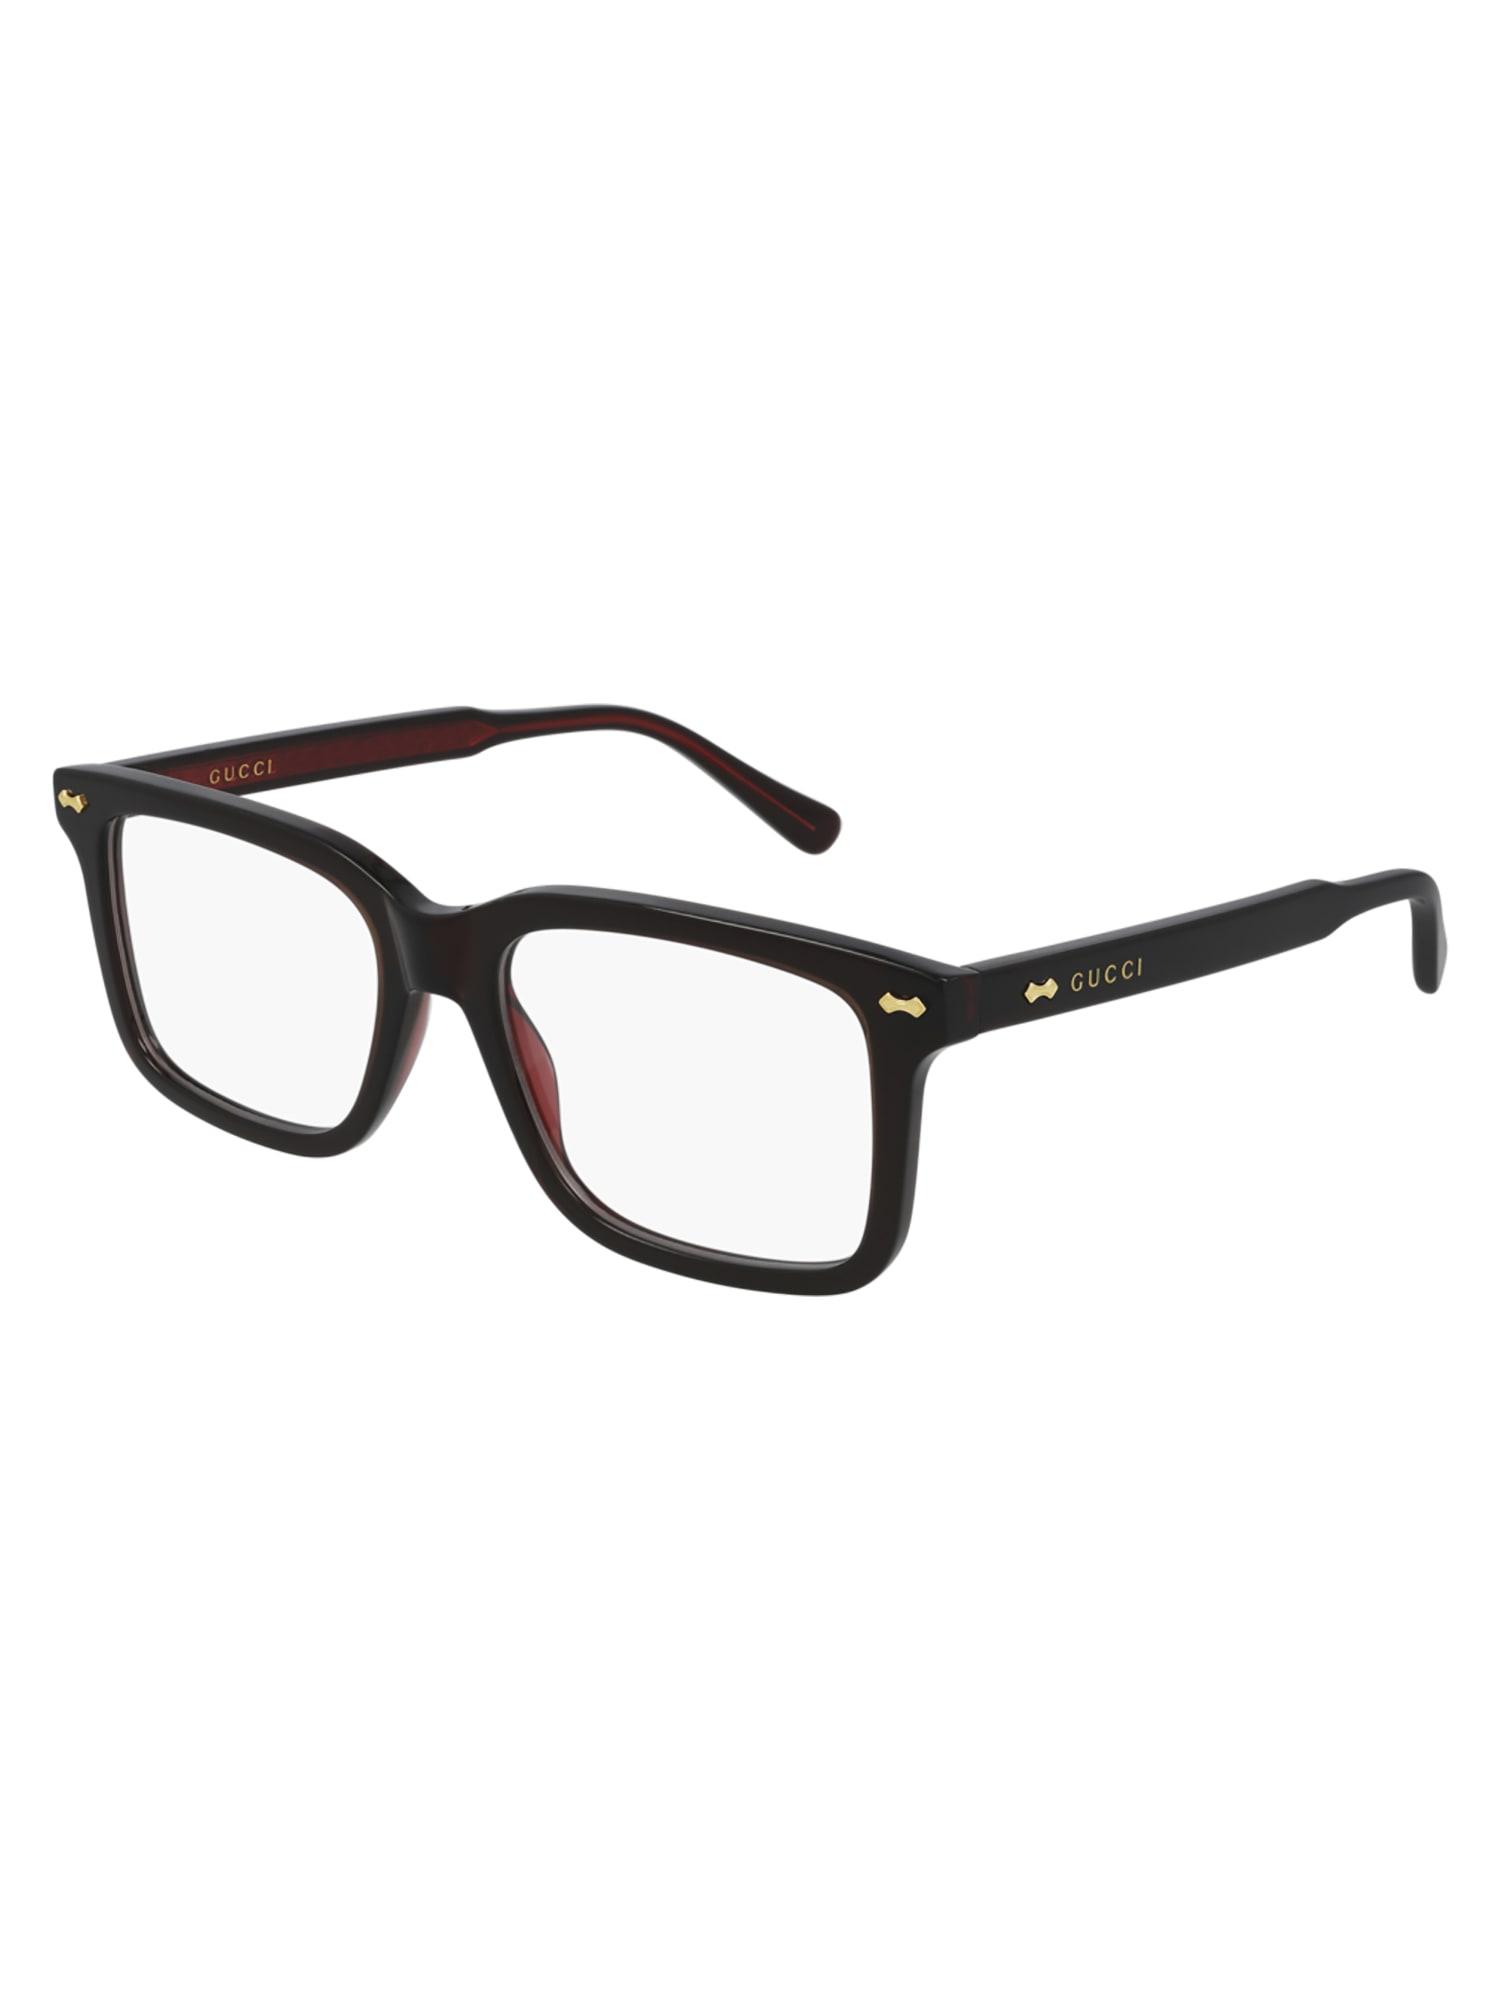 Gucci GG0914O Eyewear